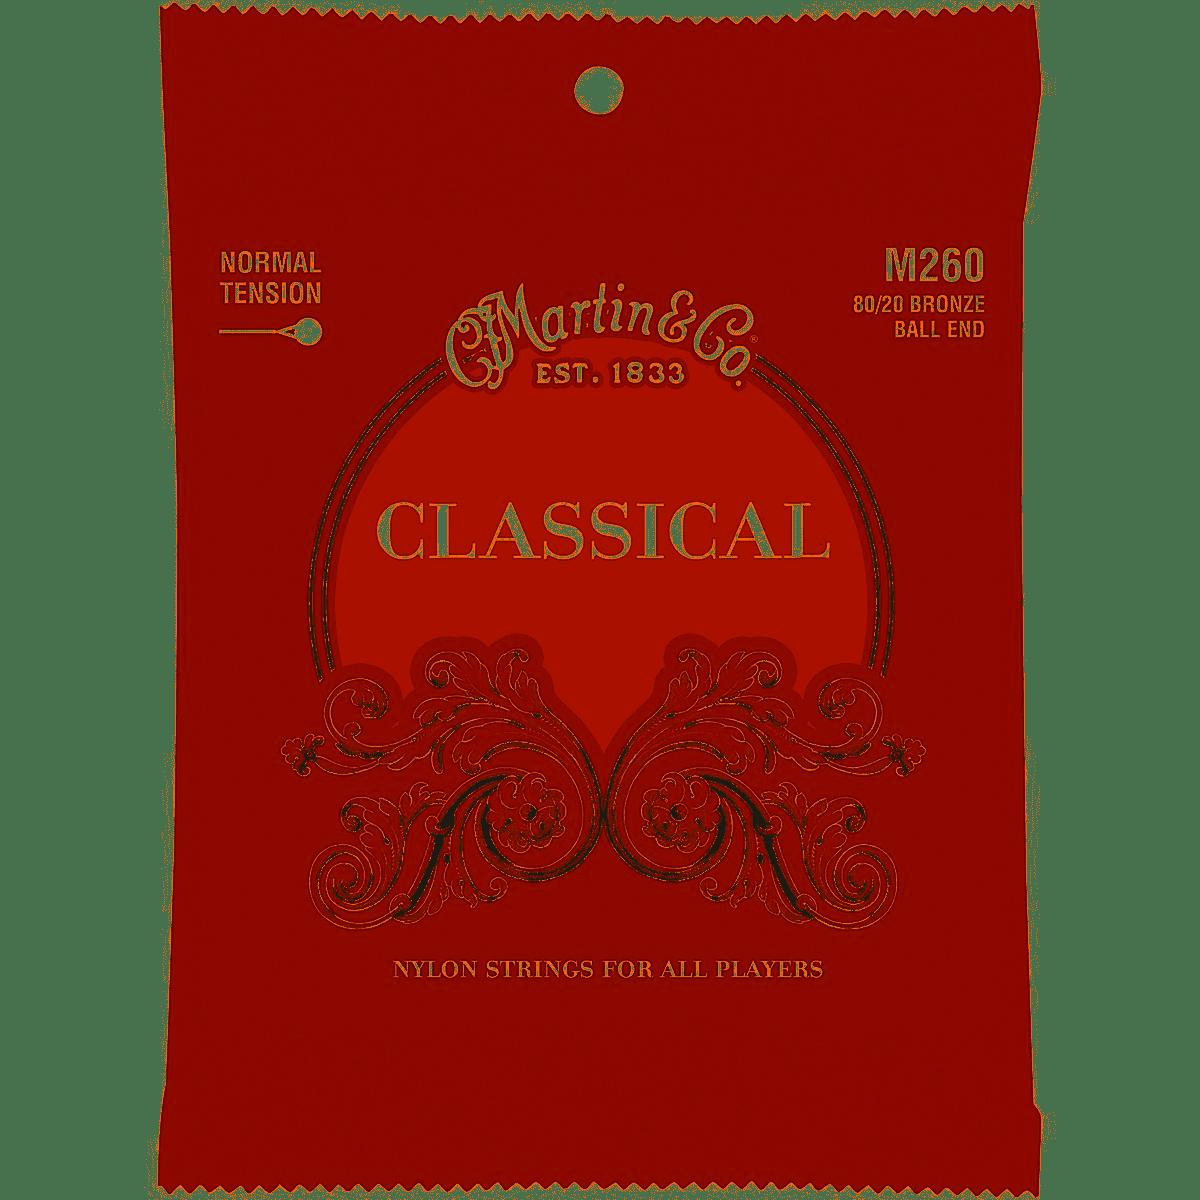 Martin & Company Classical Nylon 80/20 Bronze Ball End - Normal Tension - M260